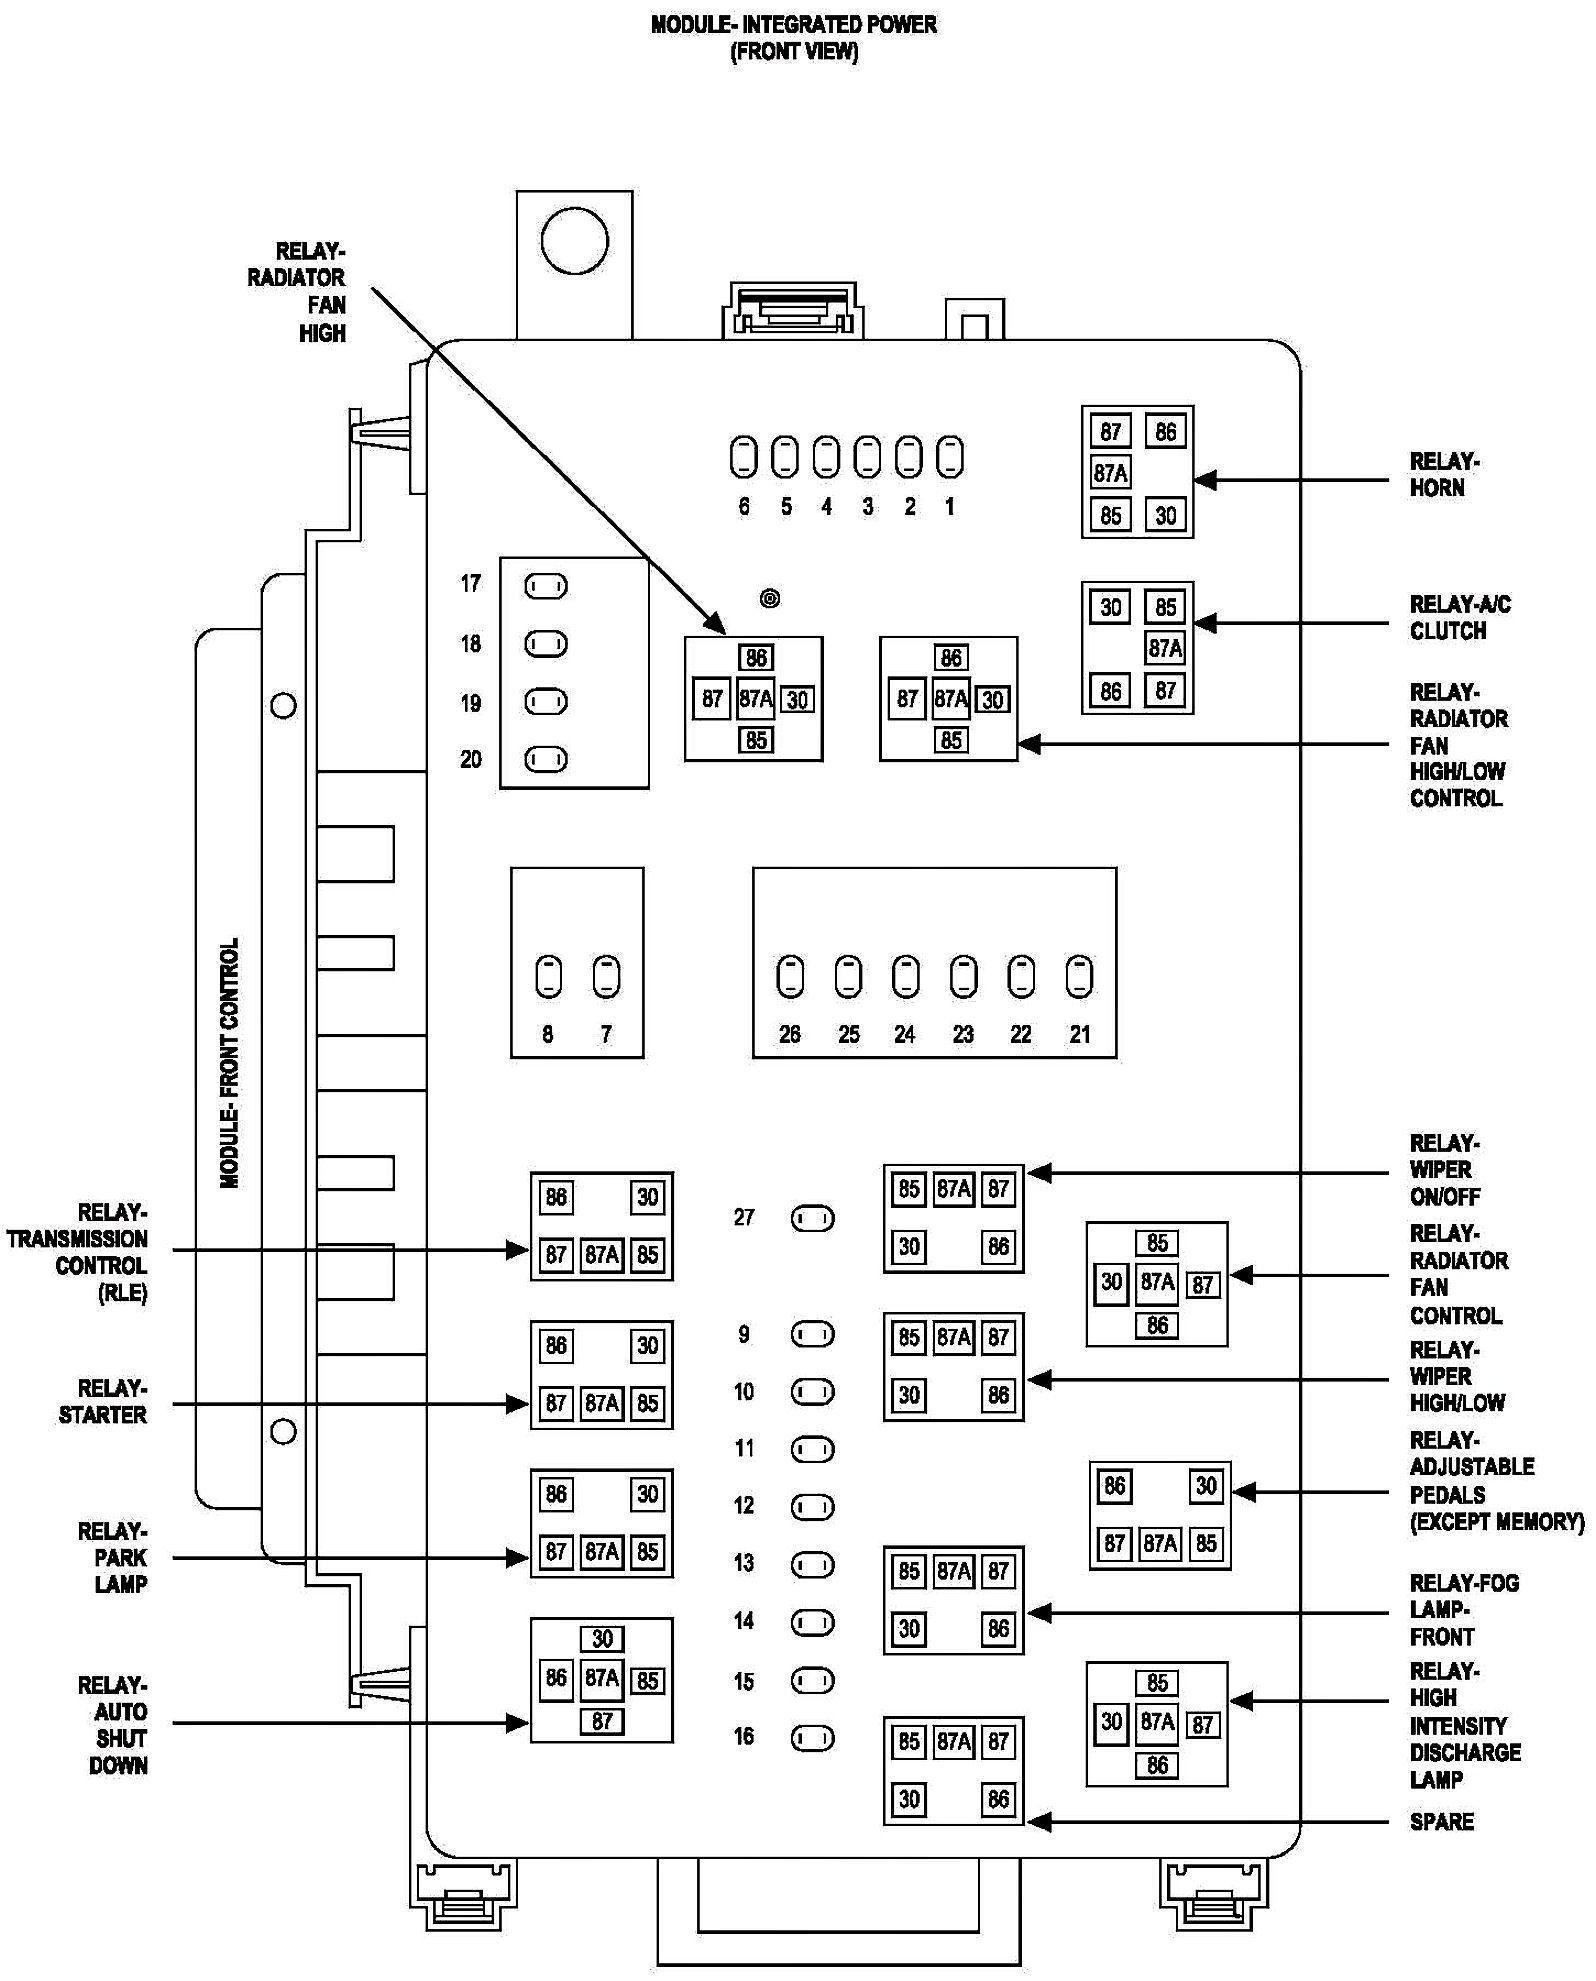 wiring diagram bass guitar valid stewmac wiring diagrams to elegant for stewmac wiring diagrams [ 1596 x 1981 Pixel ]